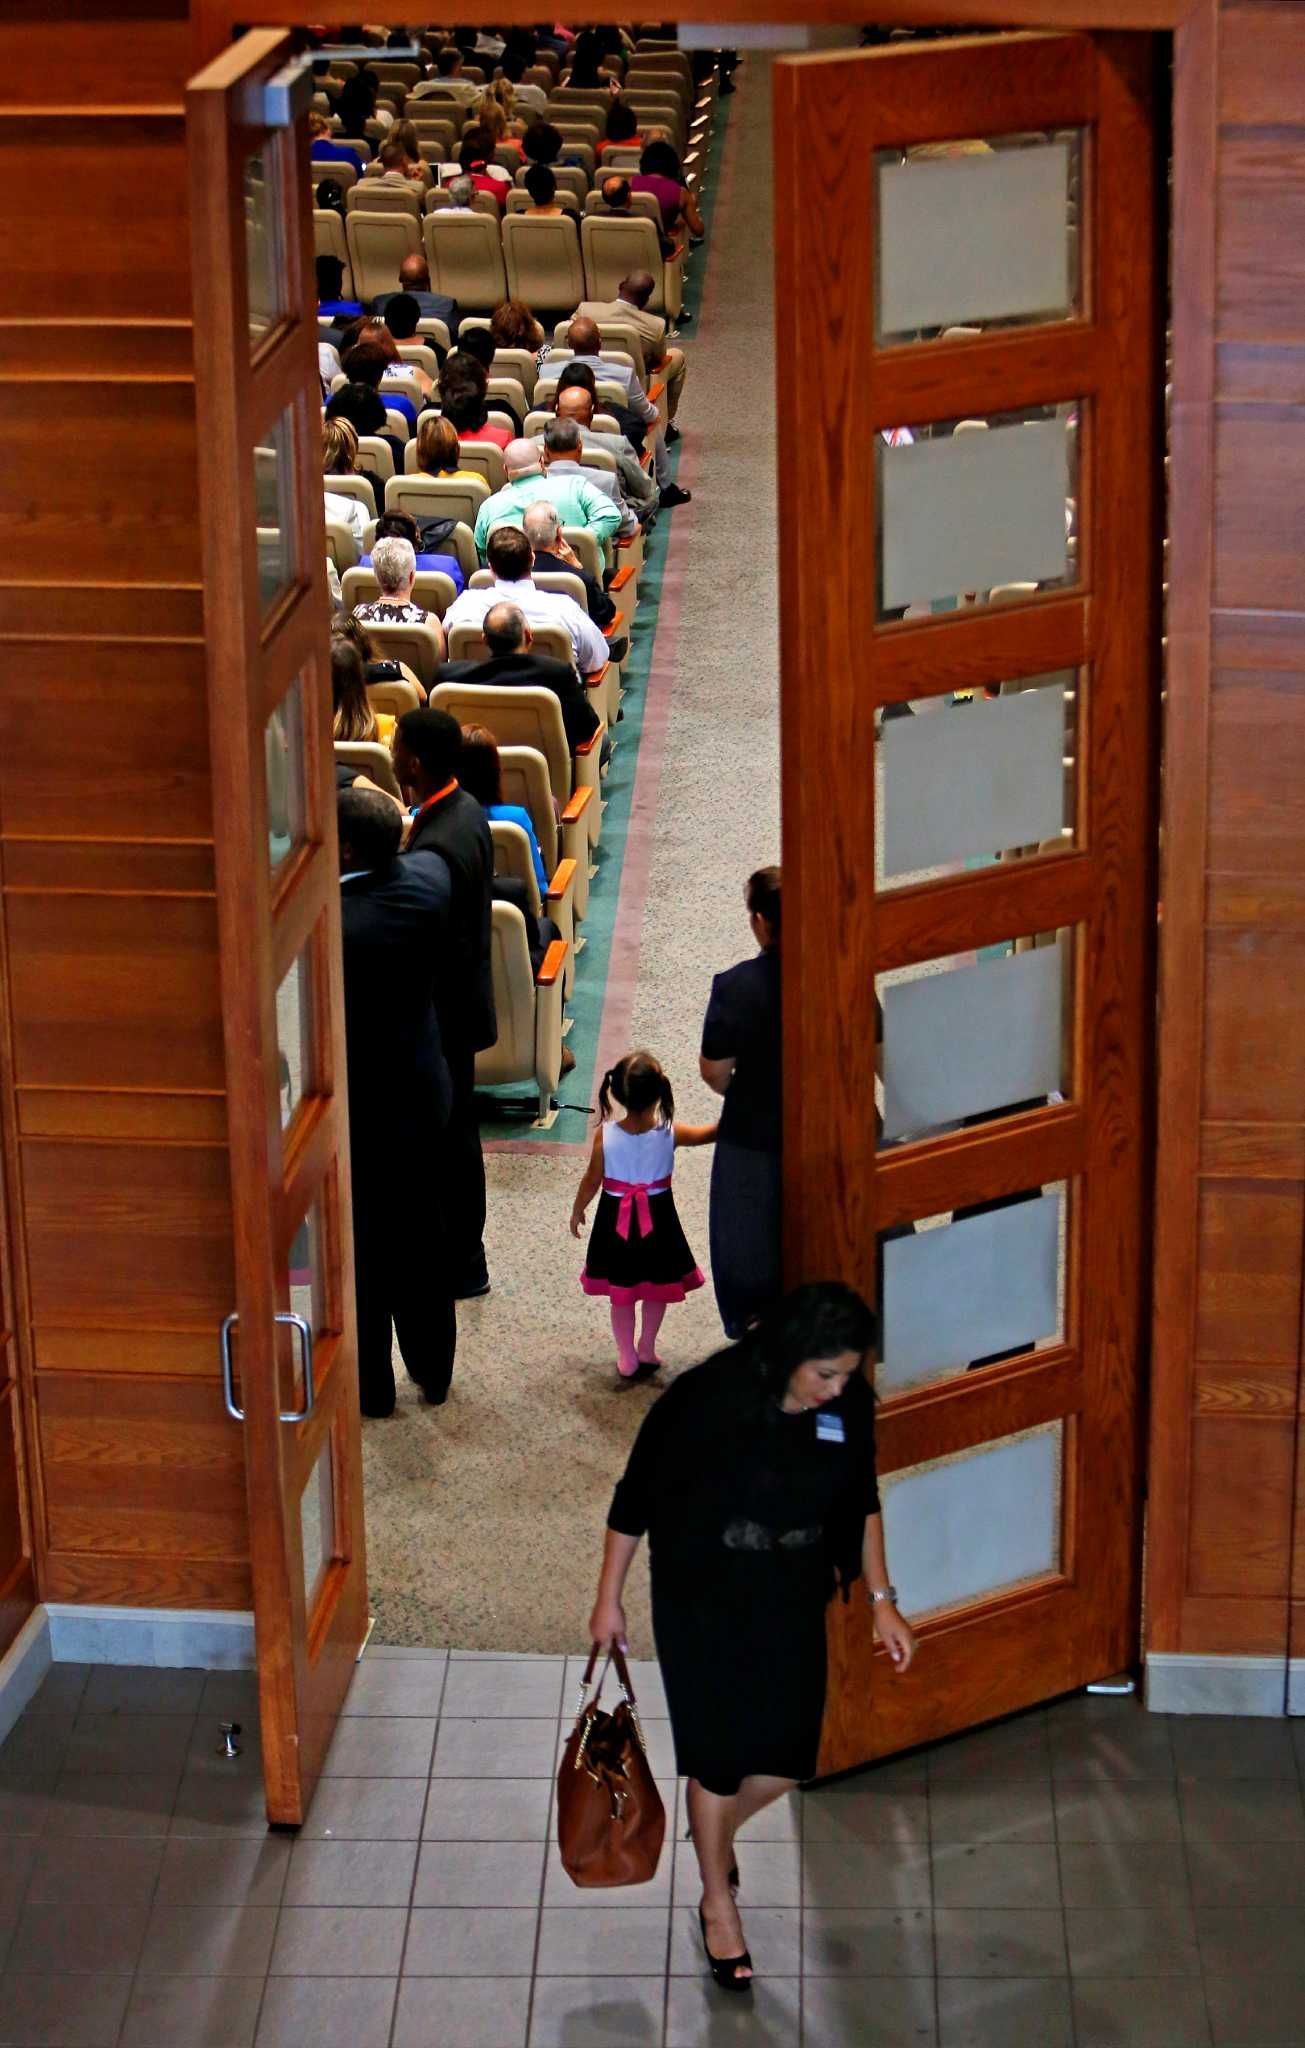 Jehovahs witnesses gathering draws thousands to rosenberg